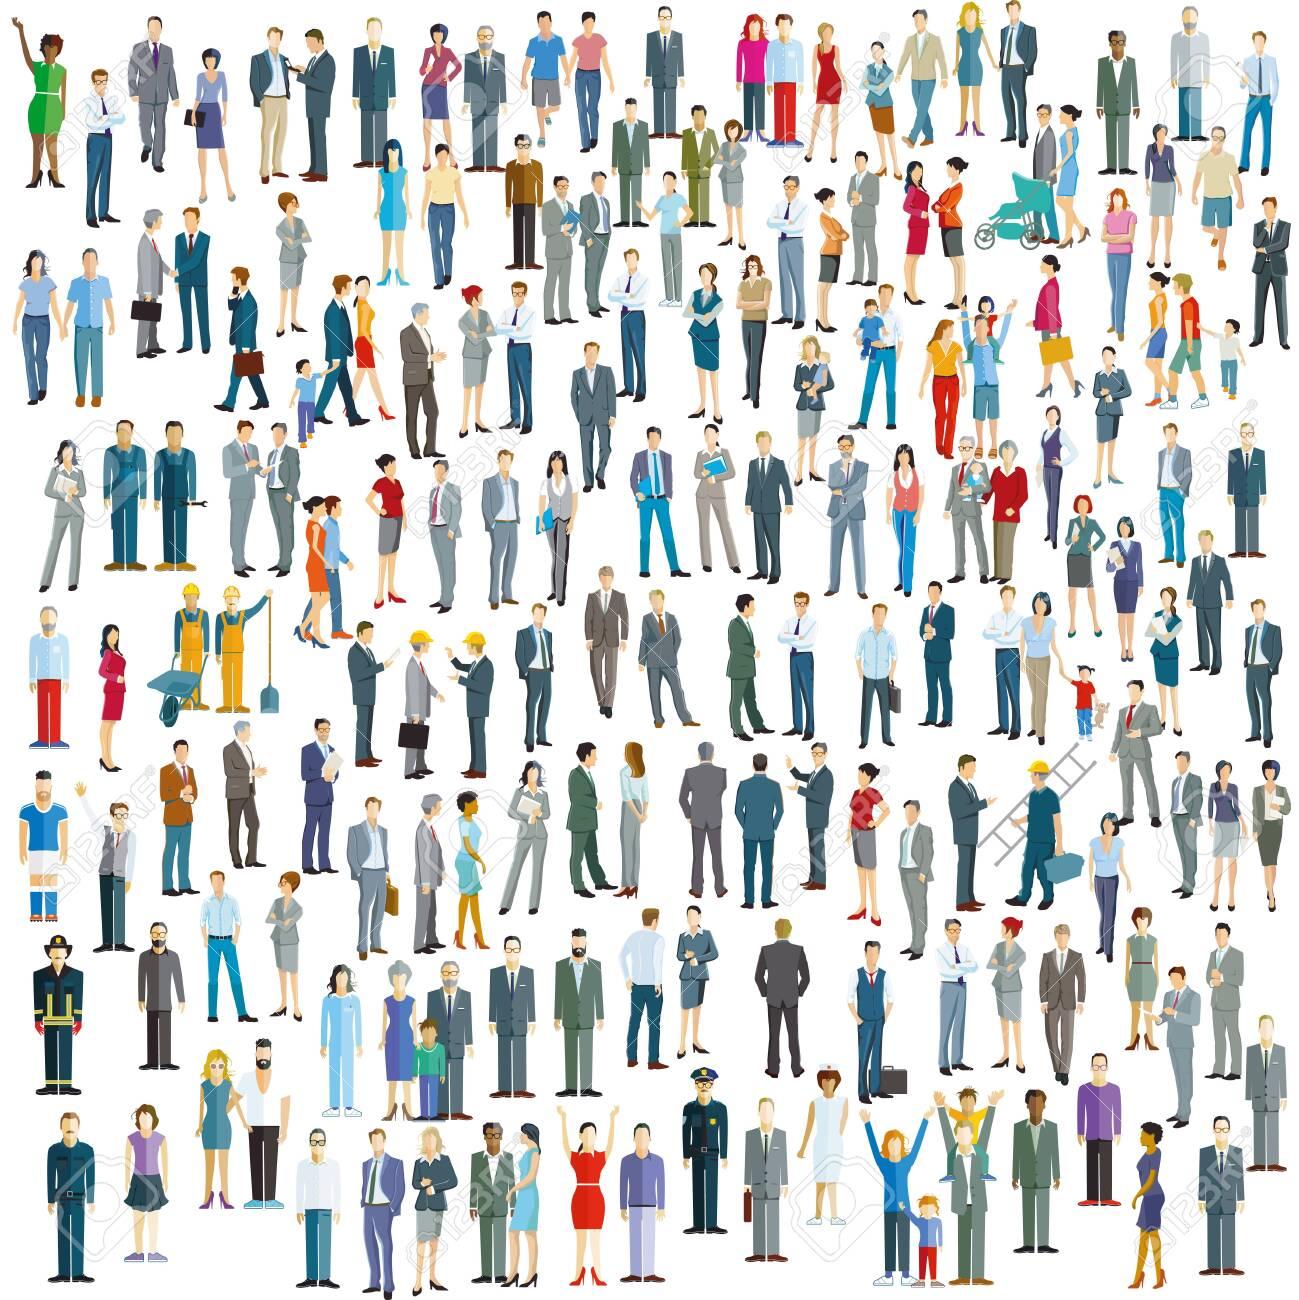 Large crowd on white background. Vector illustration - 143417391